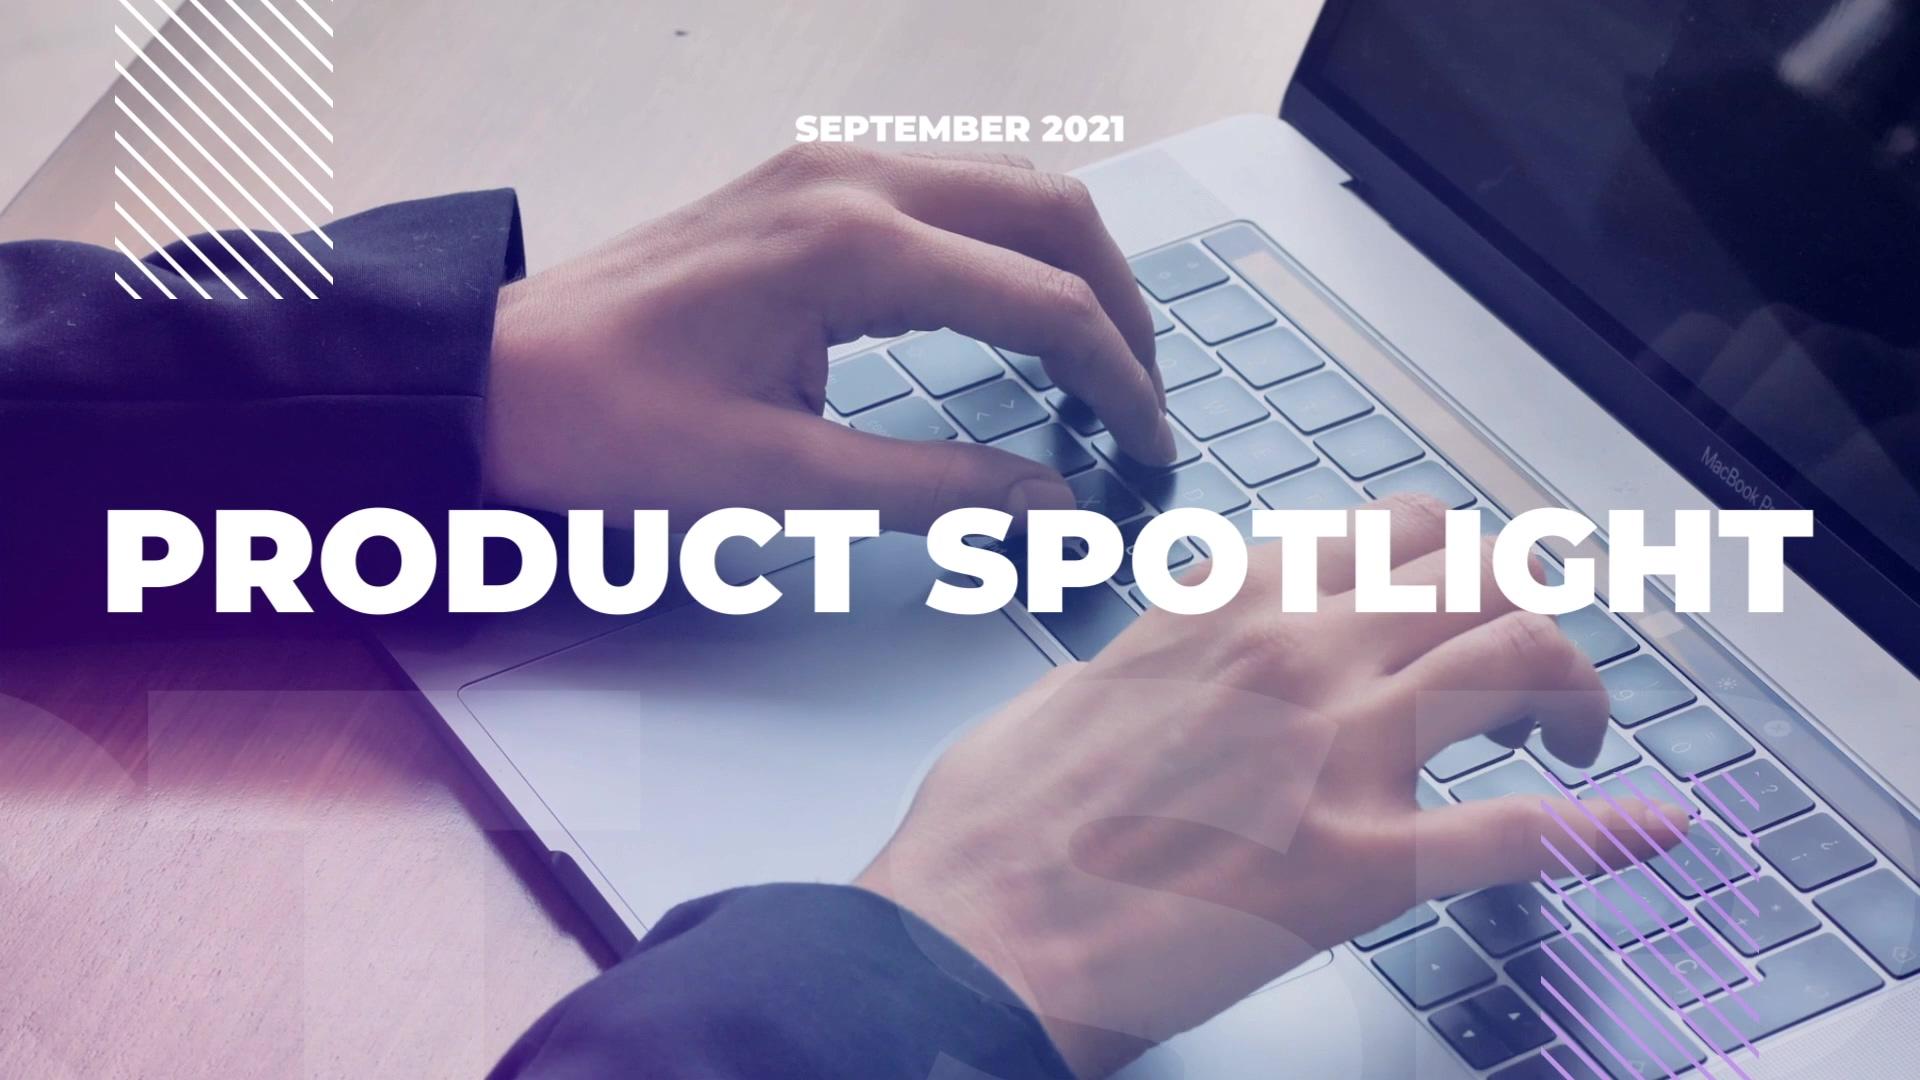 Product Spotlight - September 2021